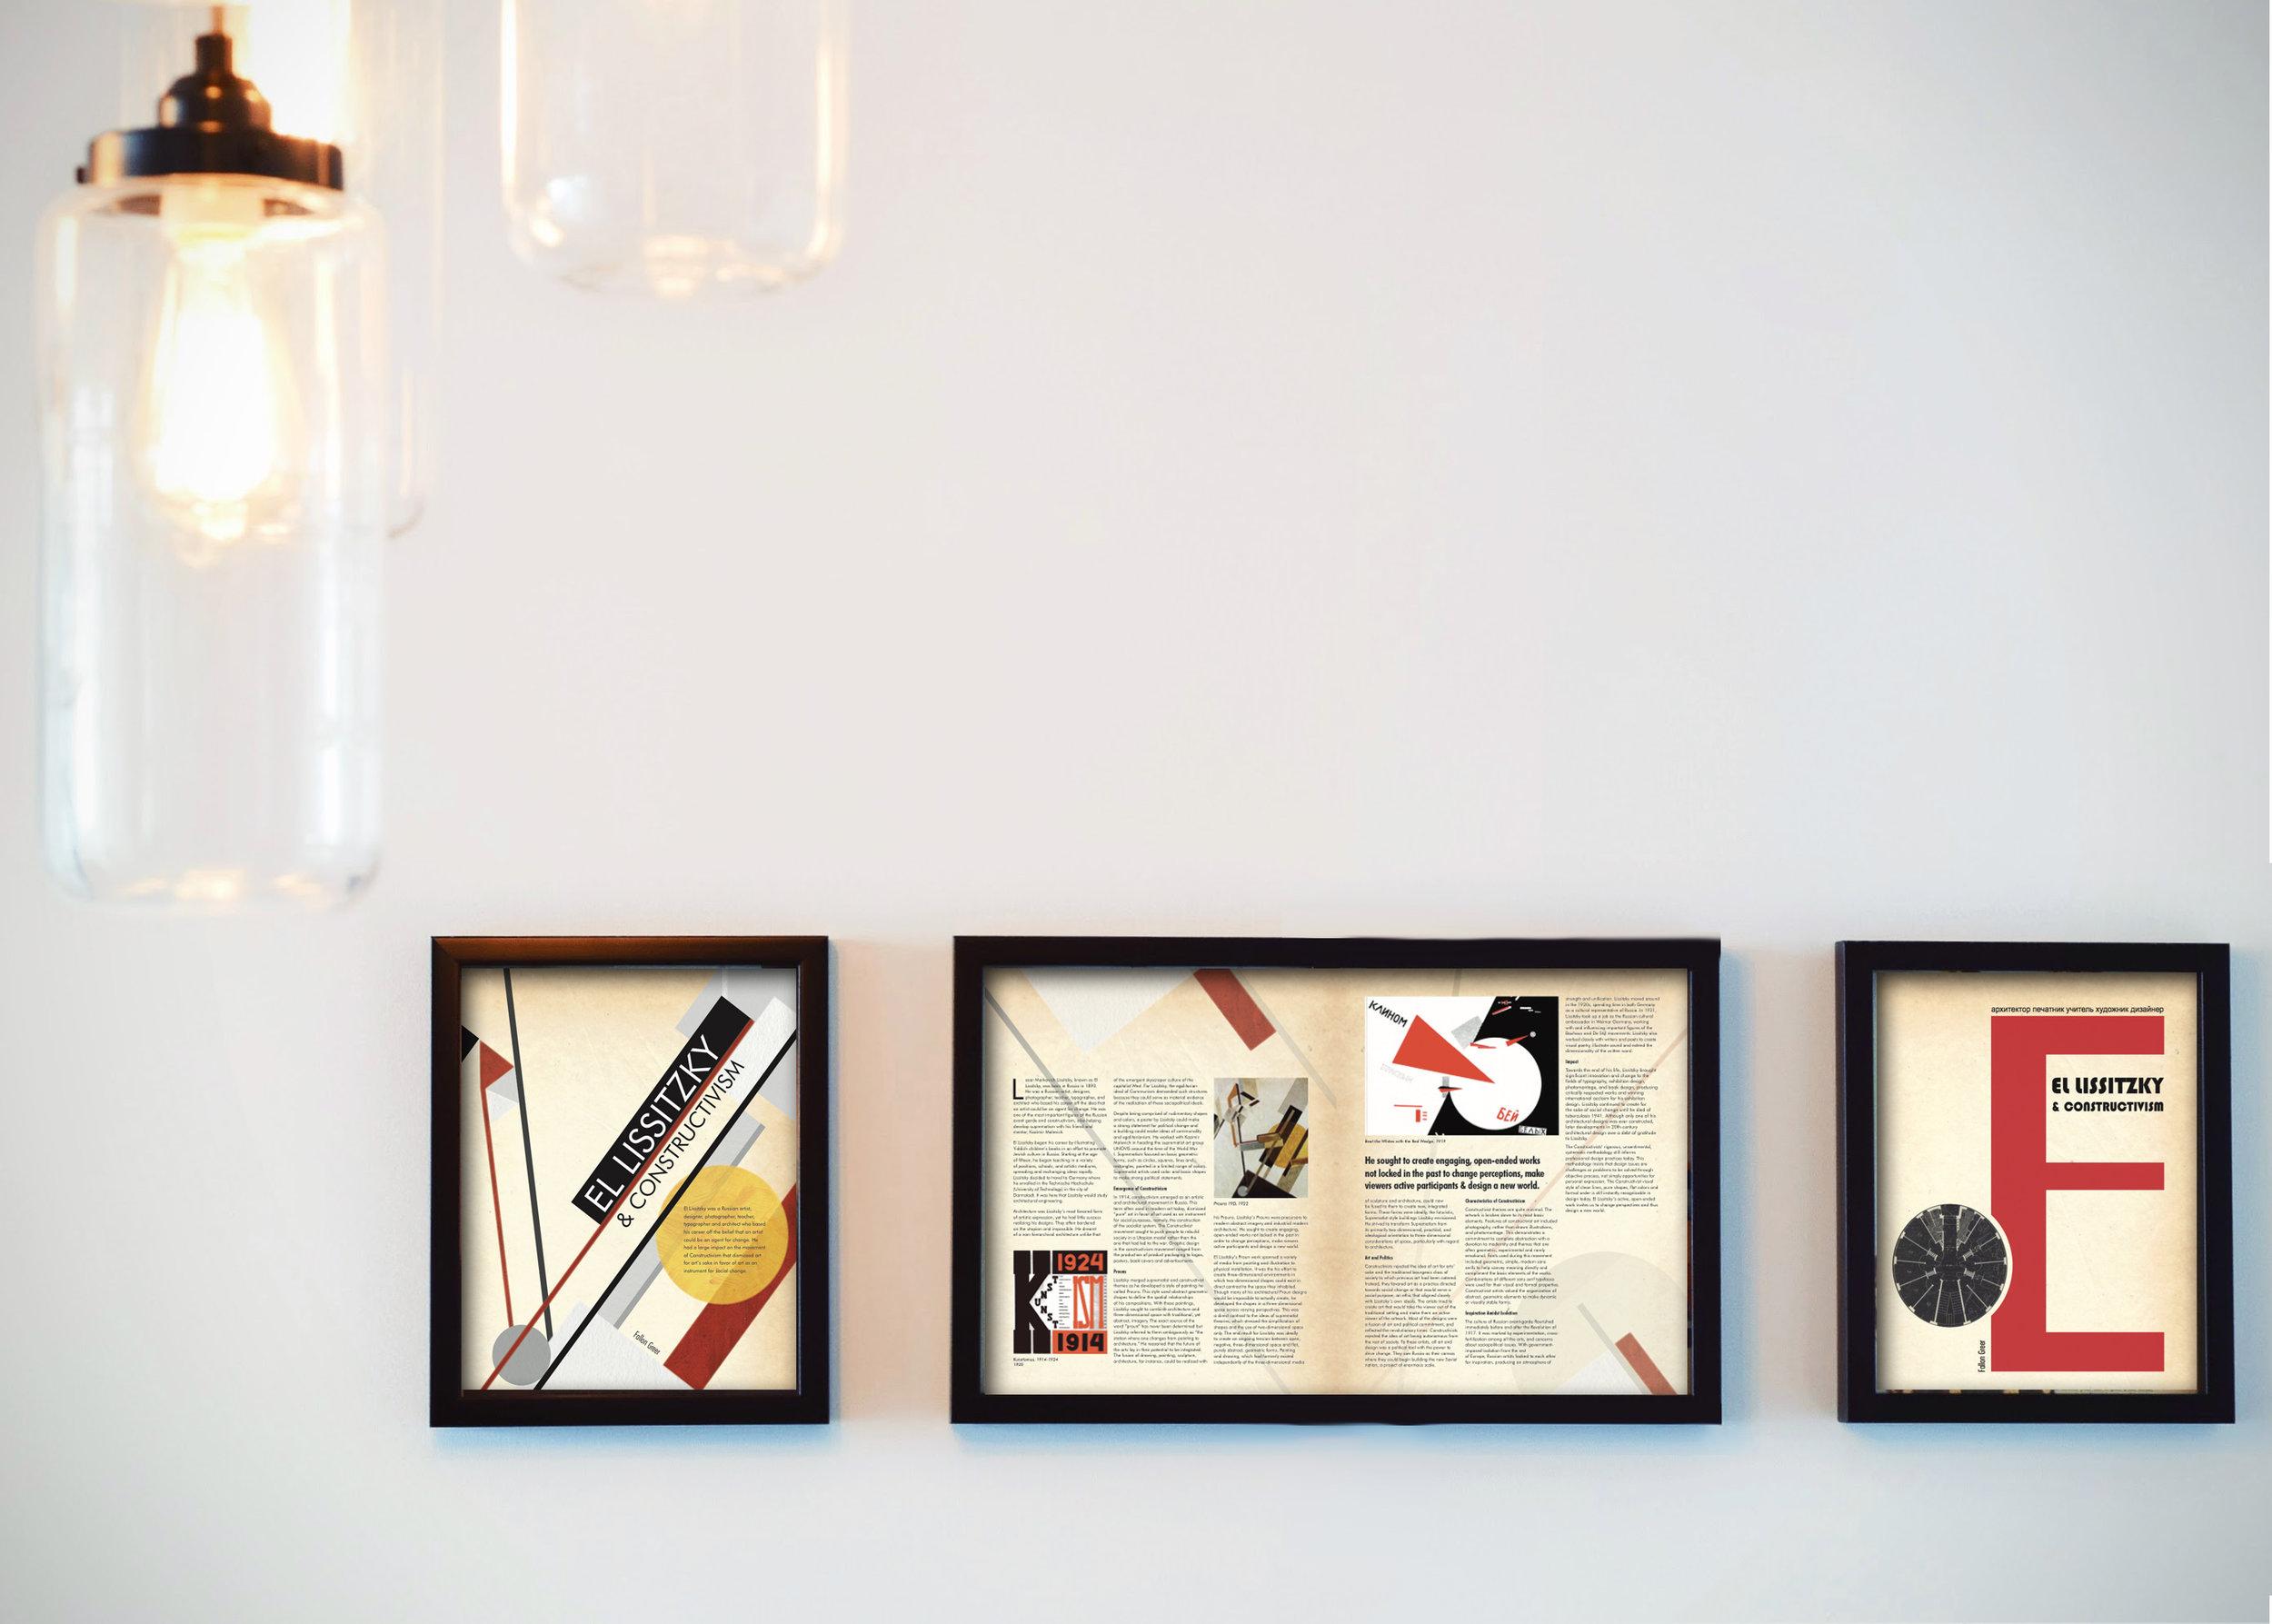 Greer_El-Lissitzky